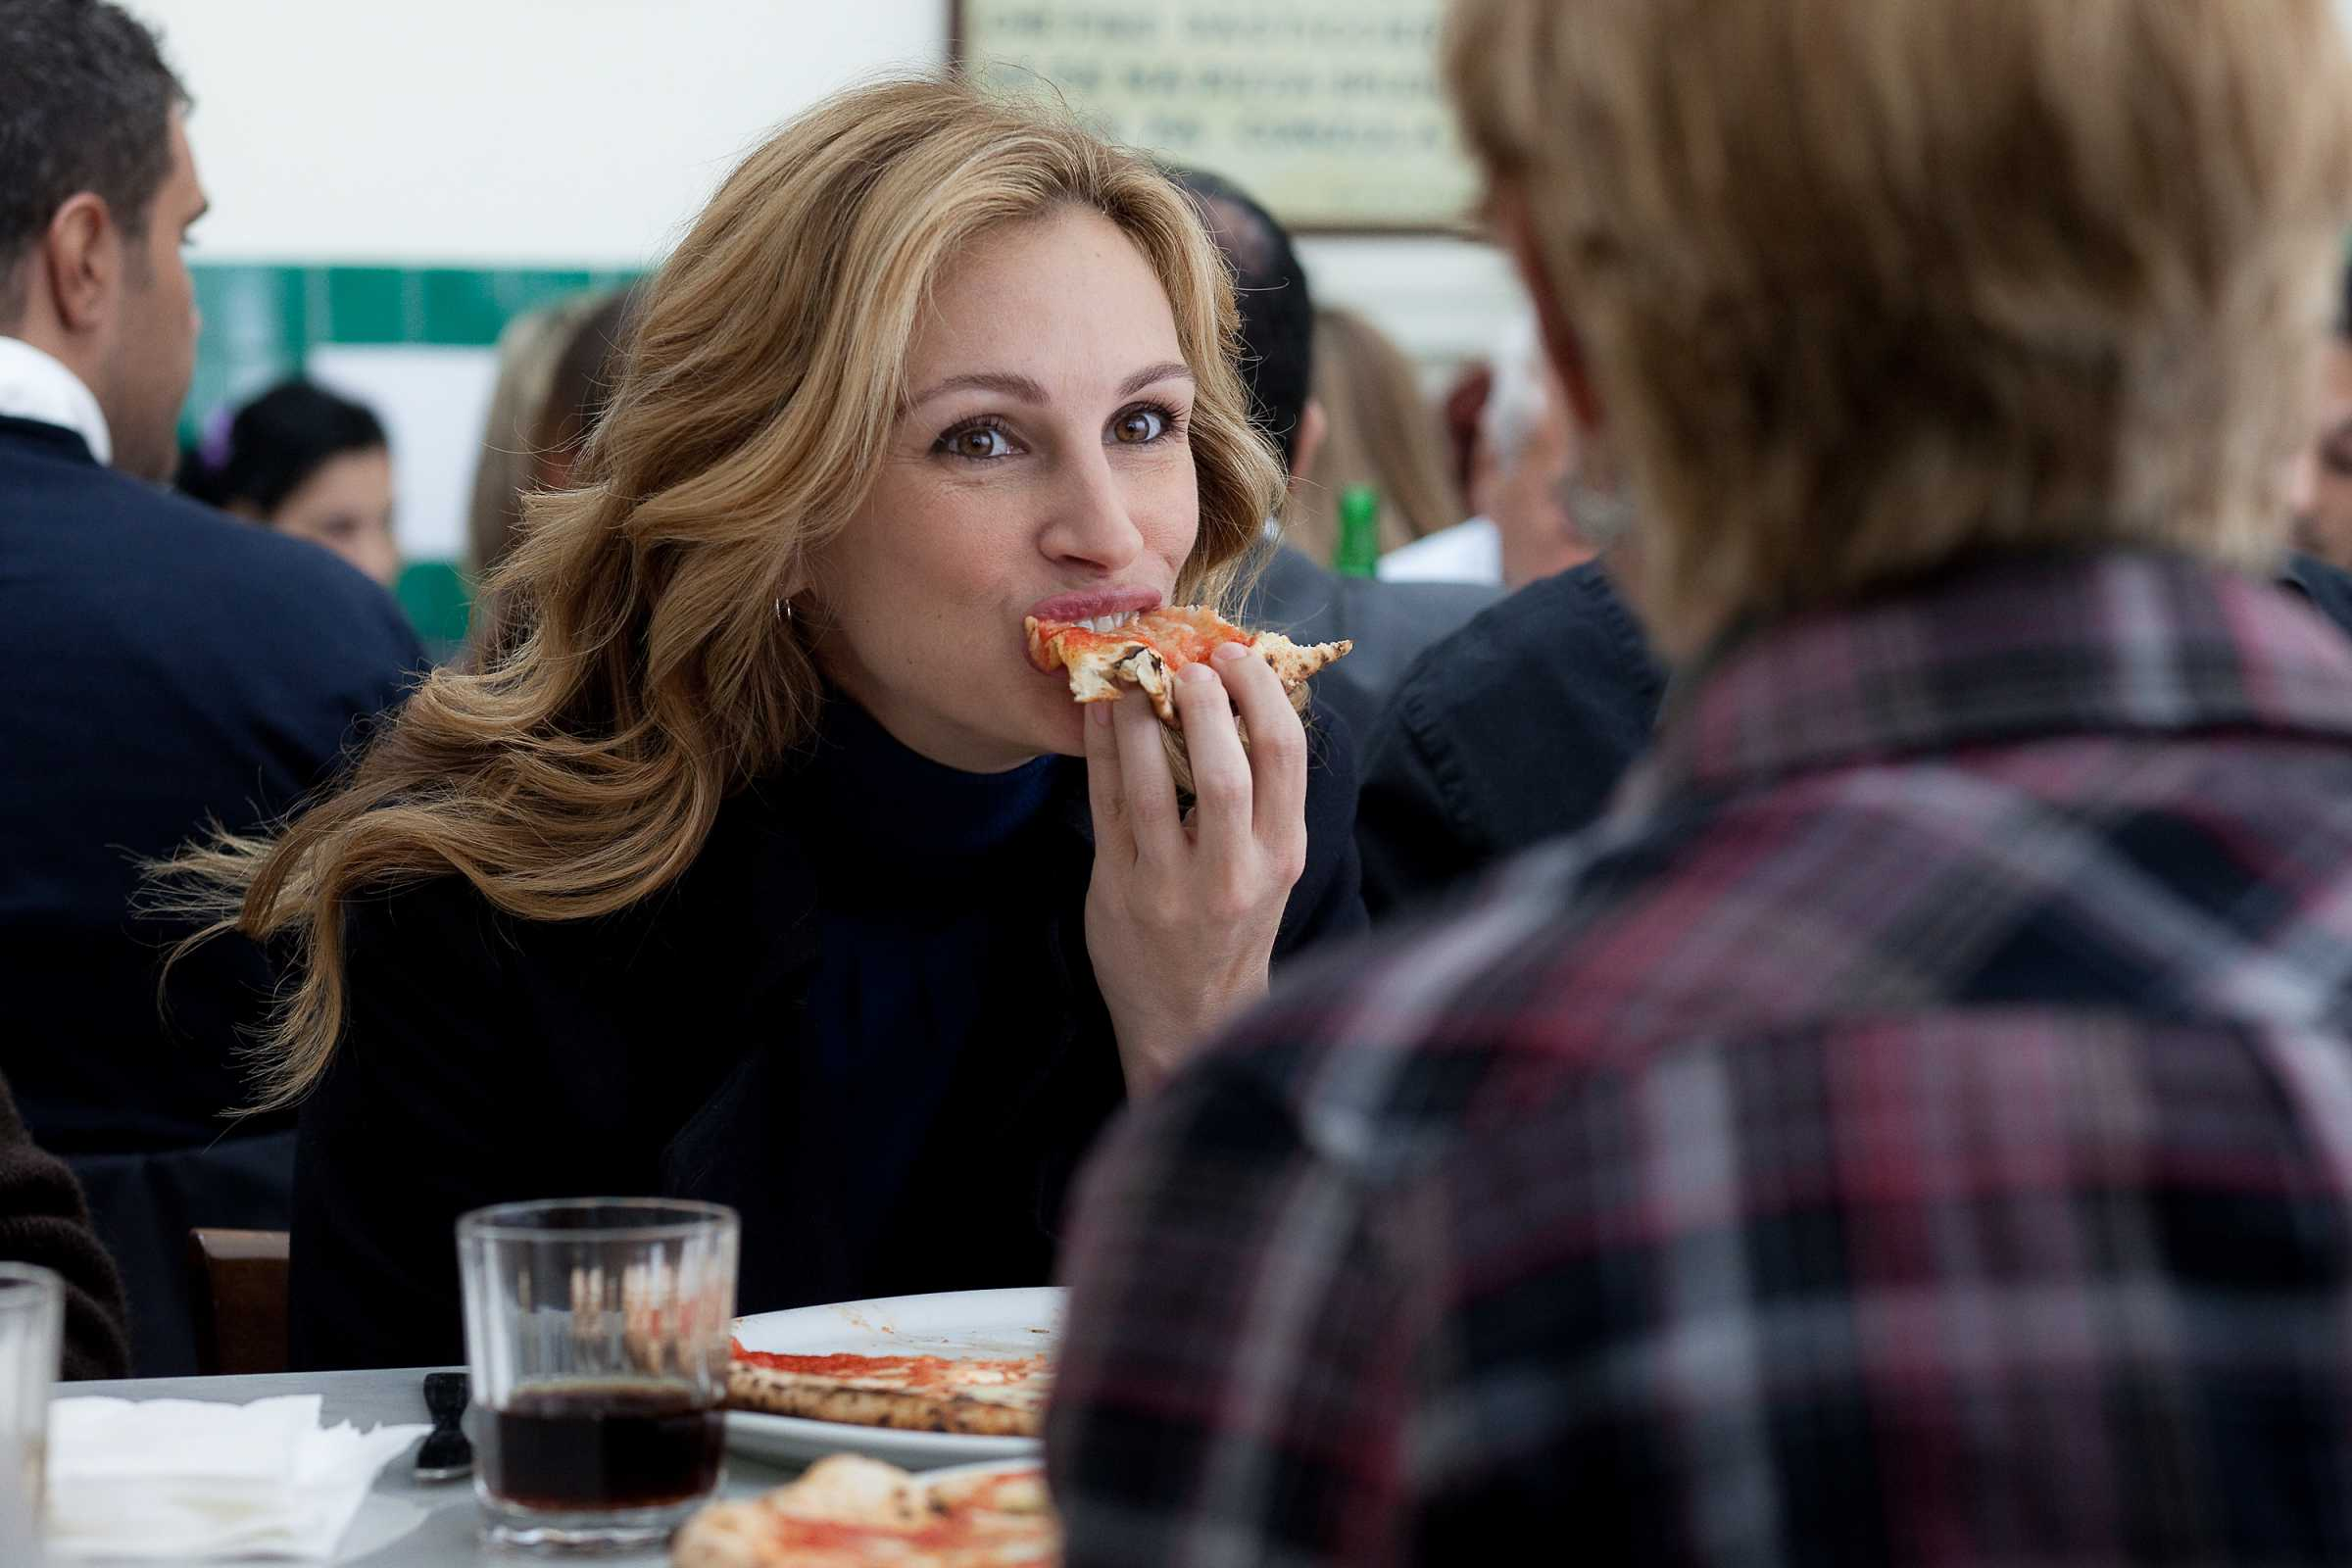 EAT PRAY LOVE Pizza | Job Seekers